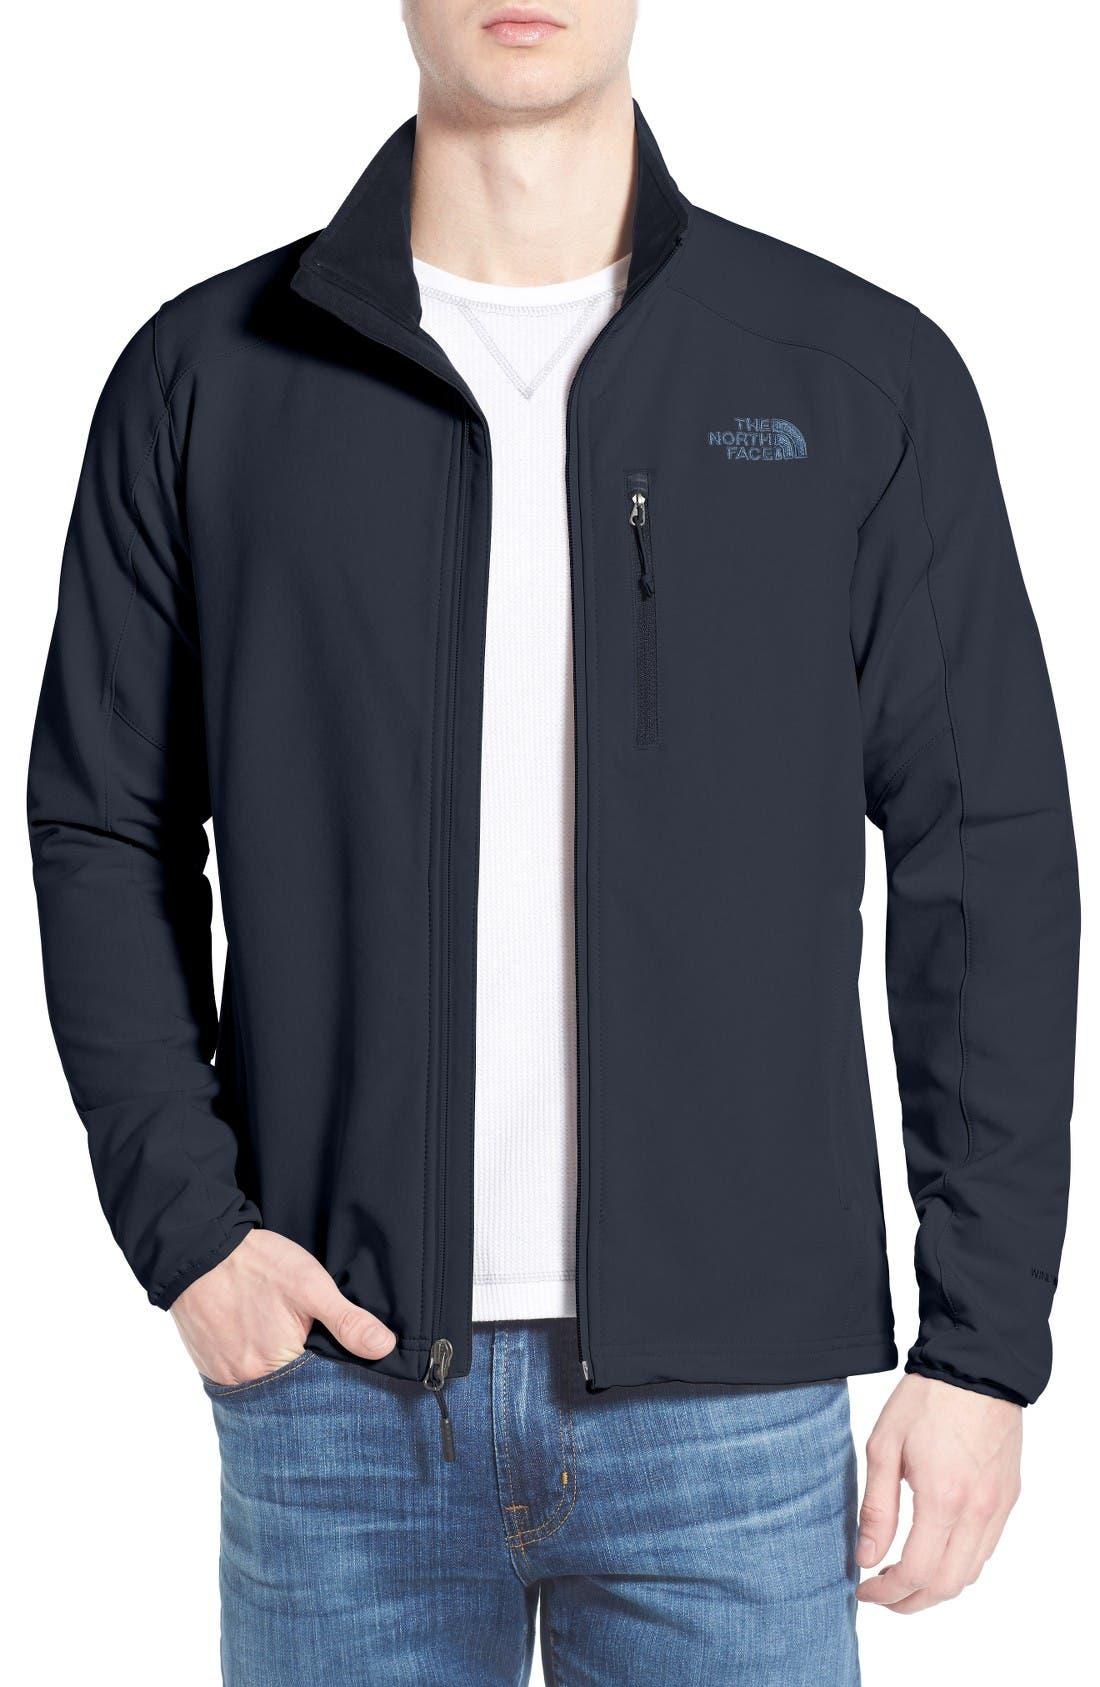 Apex Pneumatic Jacket,                             Main thumbnail 1, color,                             Urban Navy/ Urban Navy